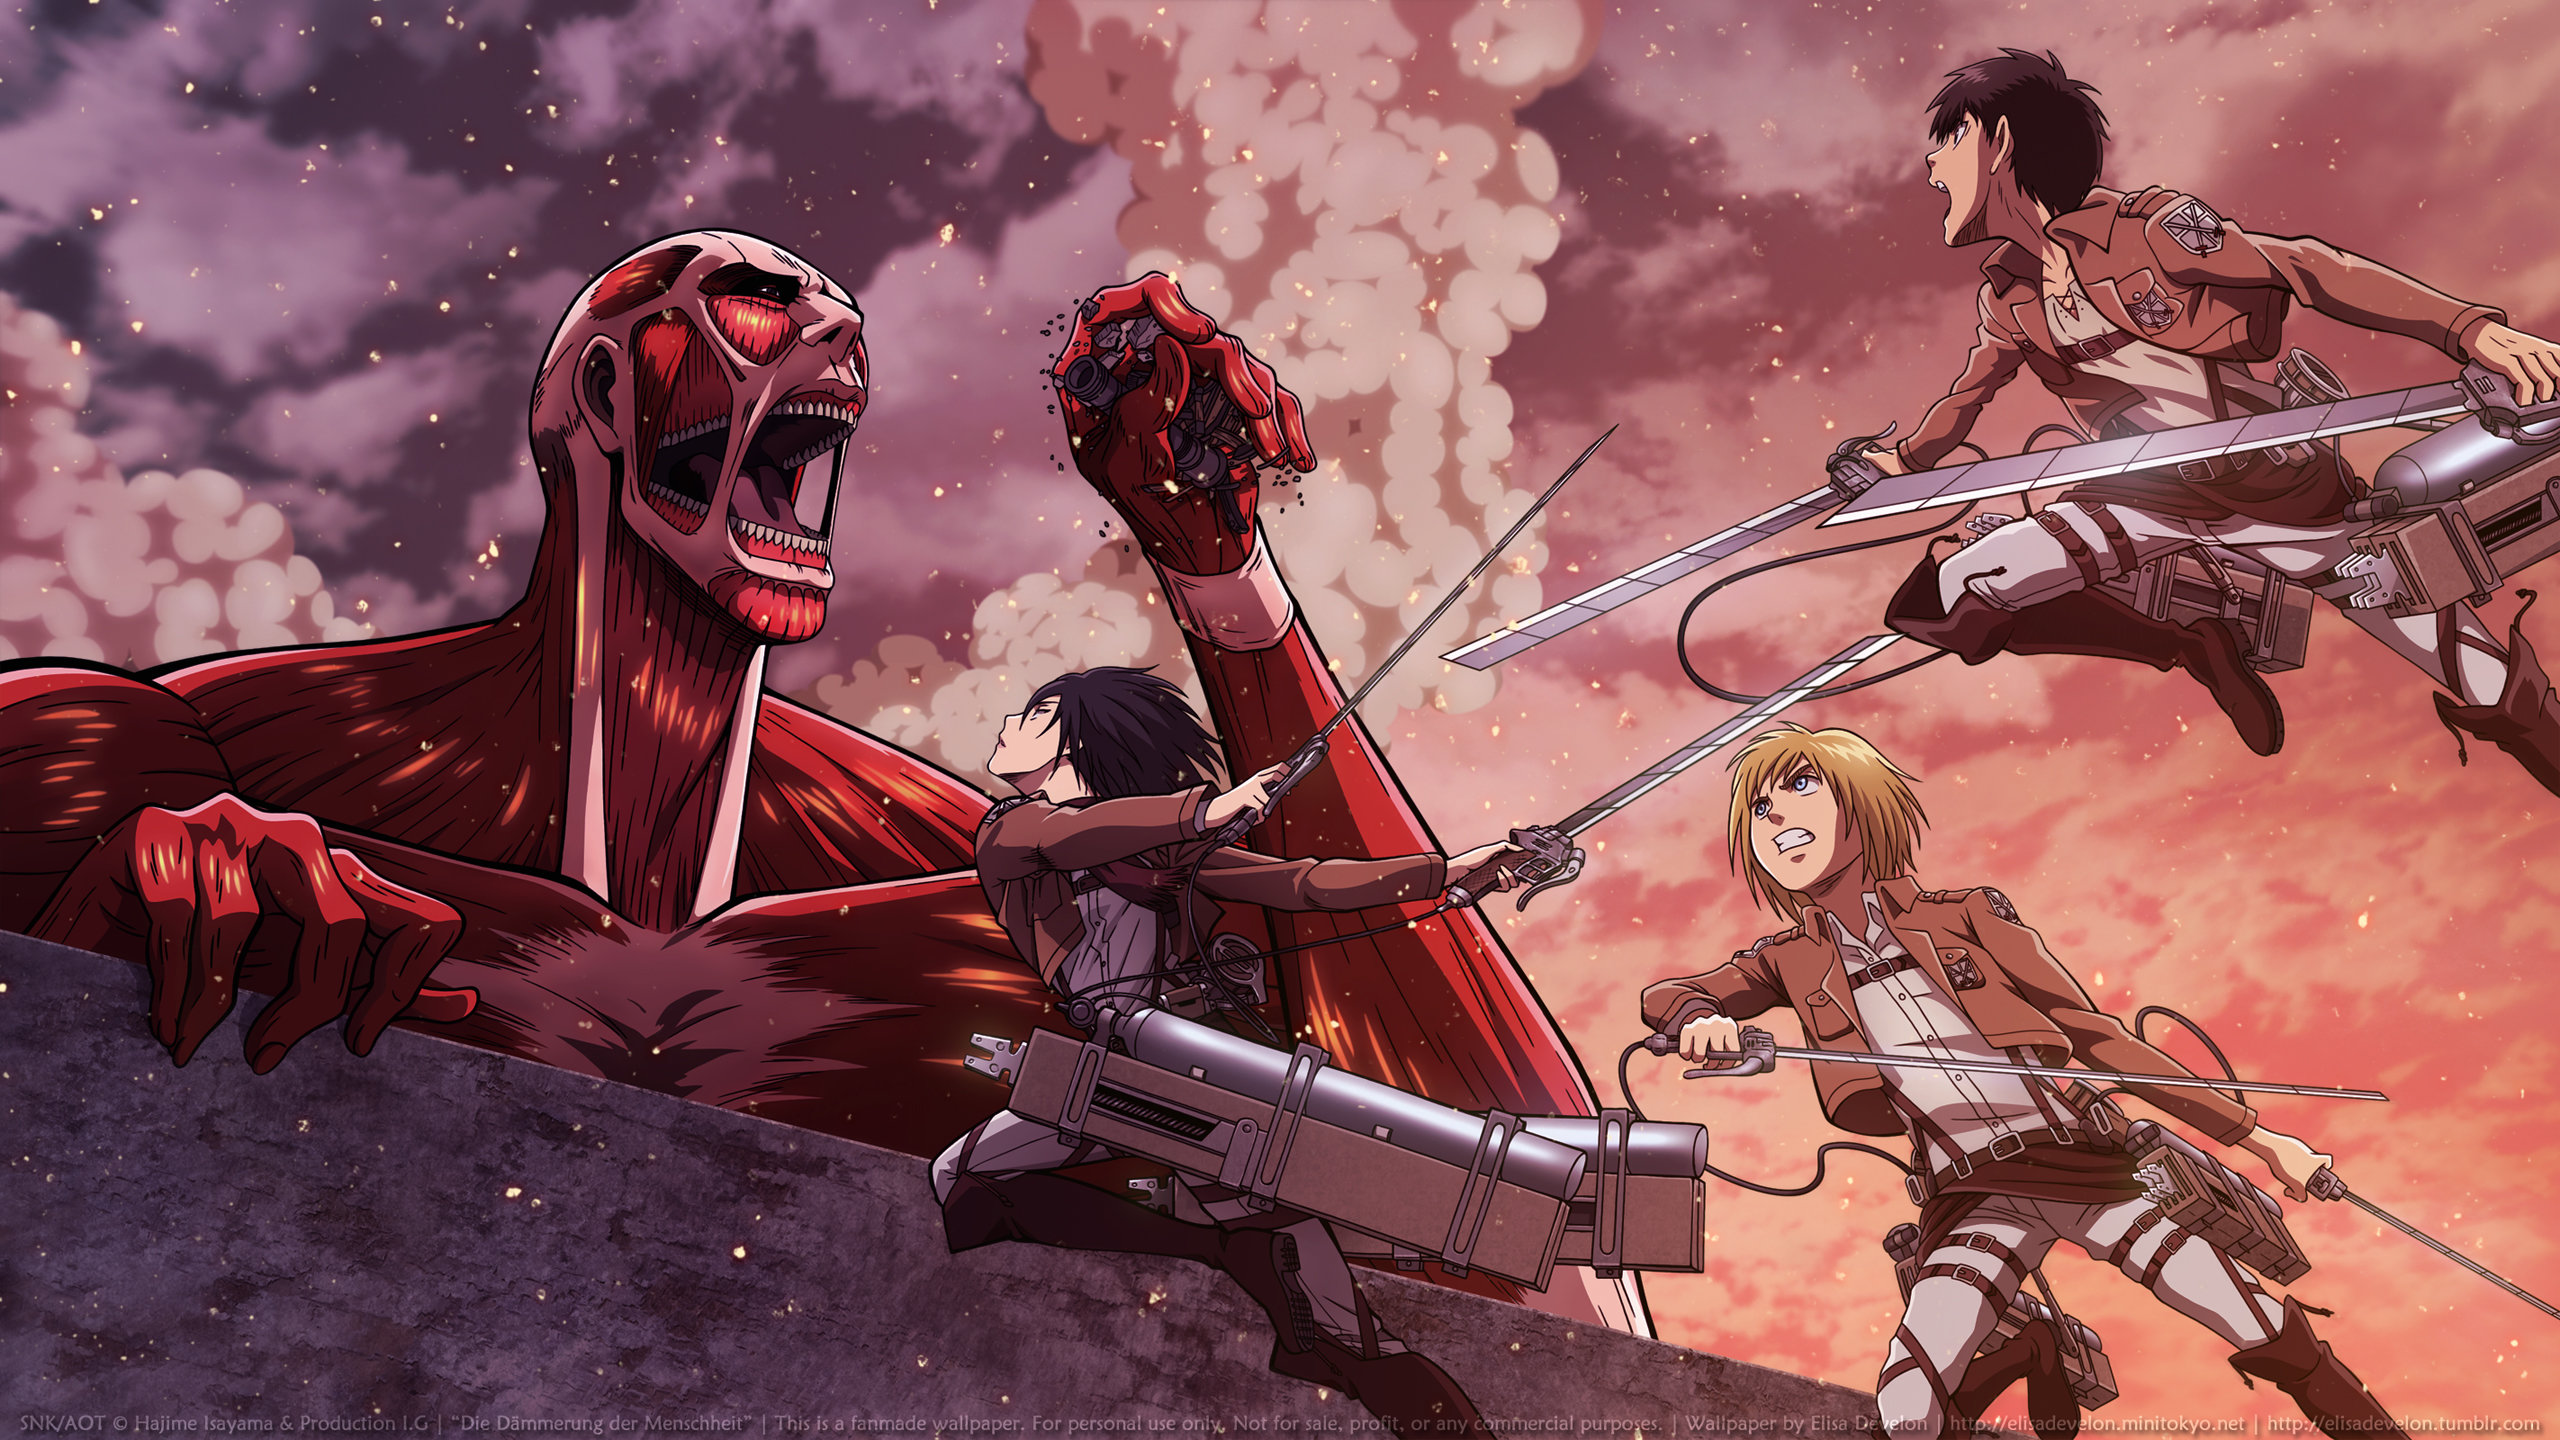 Best Attack On Titan Background Id Shingeki No Kyojin Wallpaper Hd 2560x1440 Download Hd Wallpaper Wallpapertip